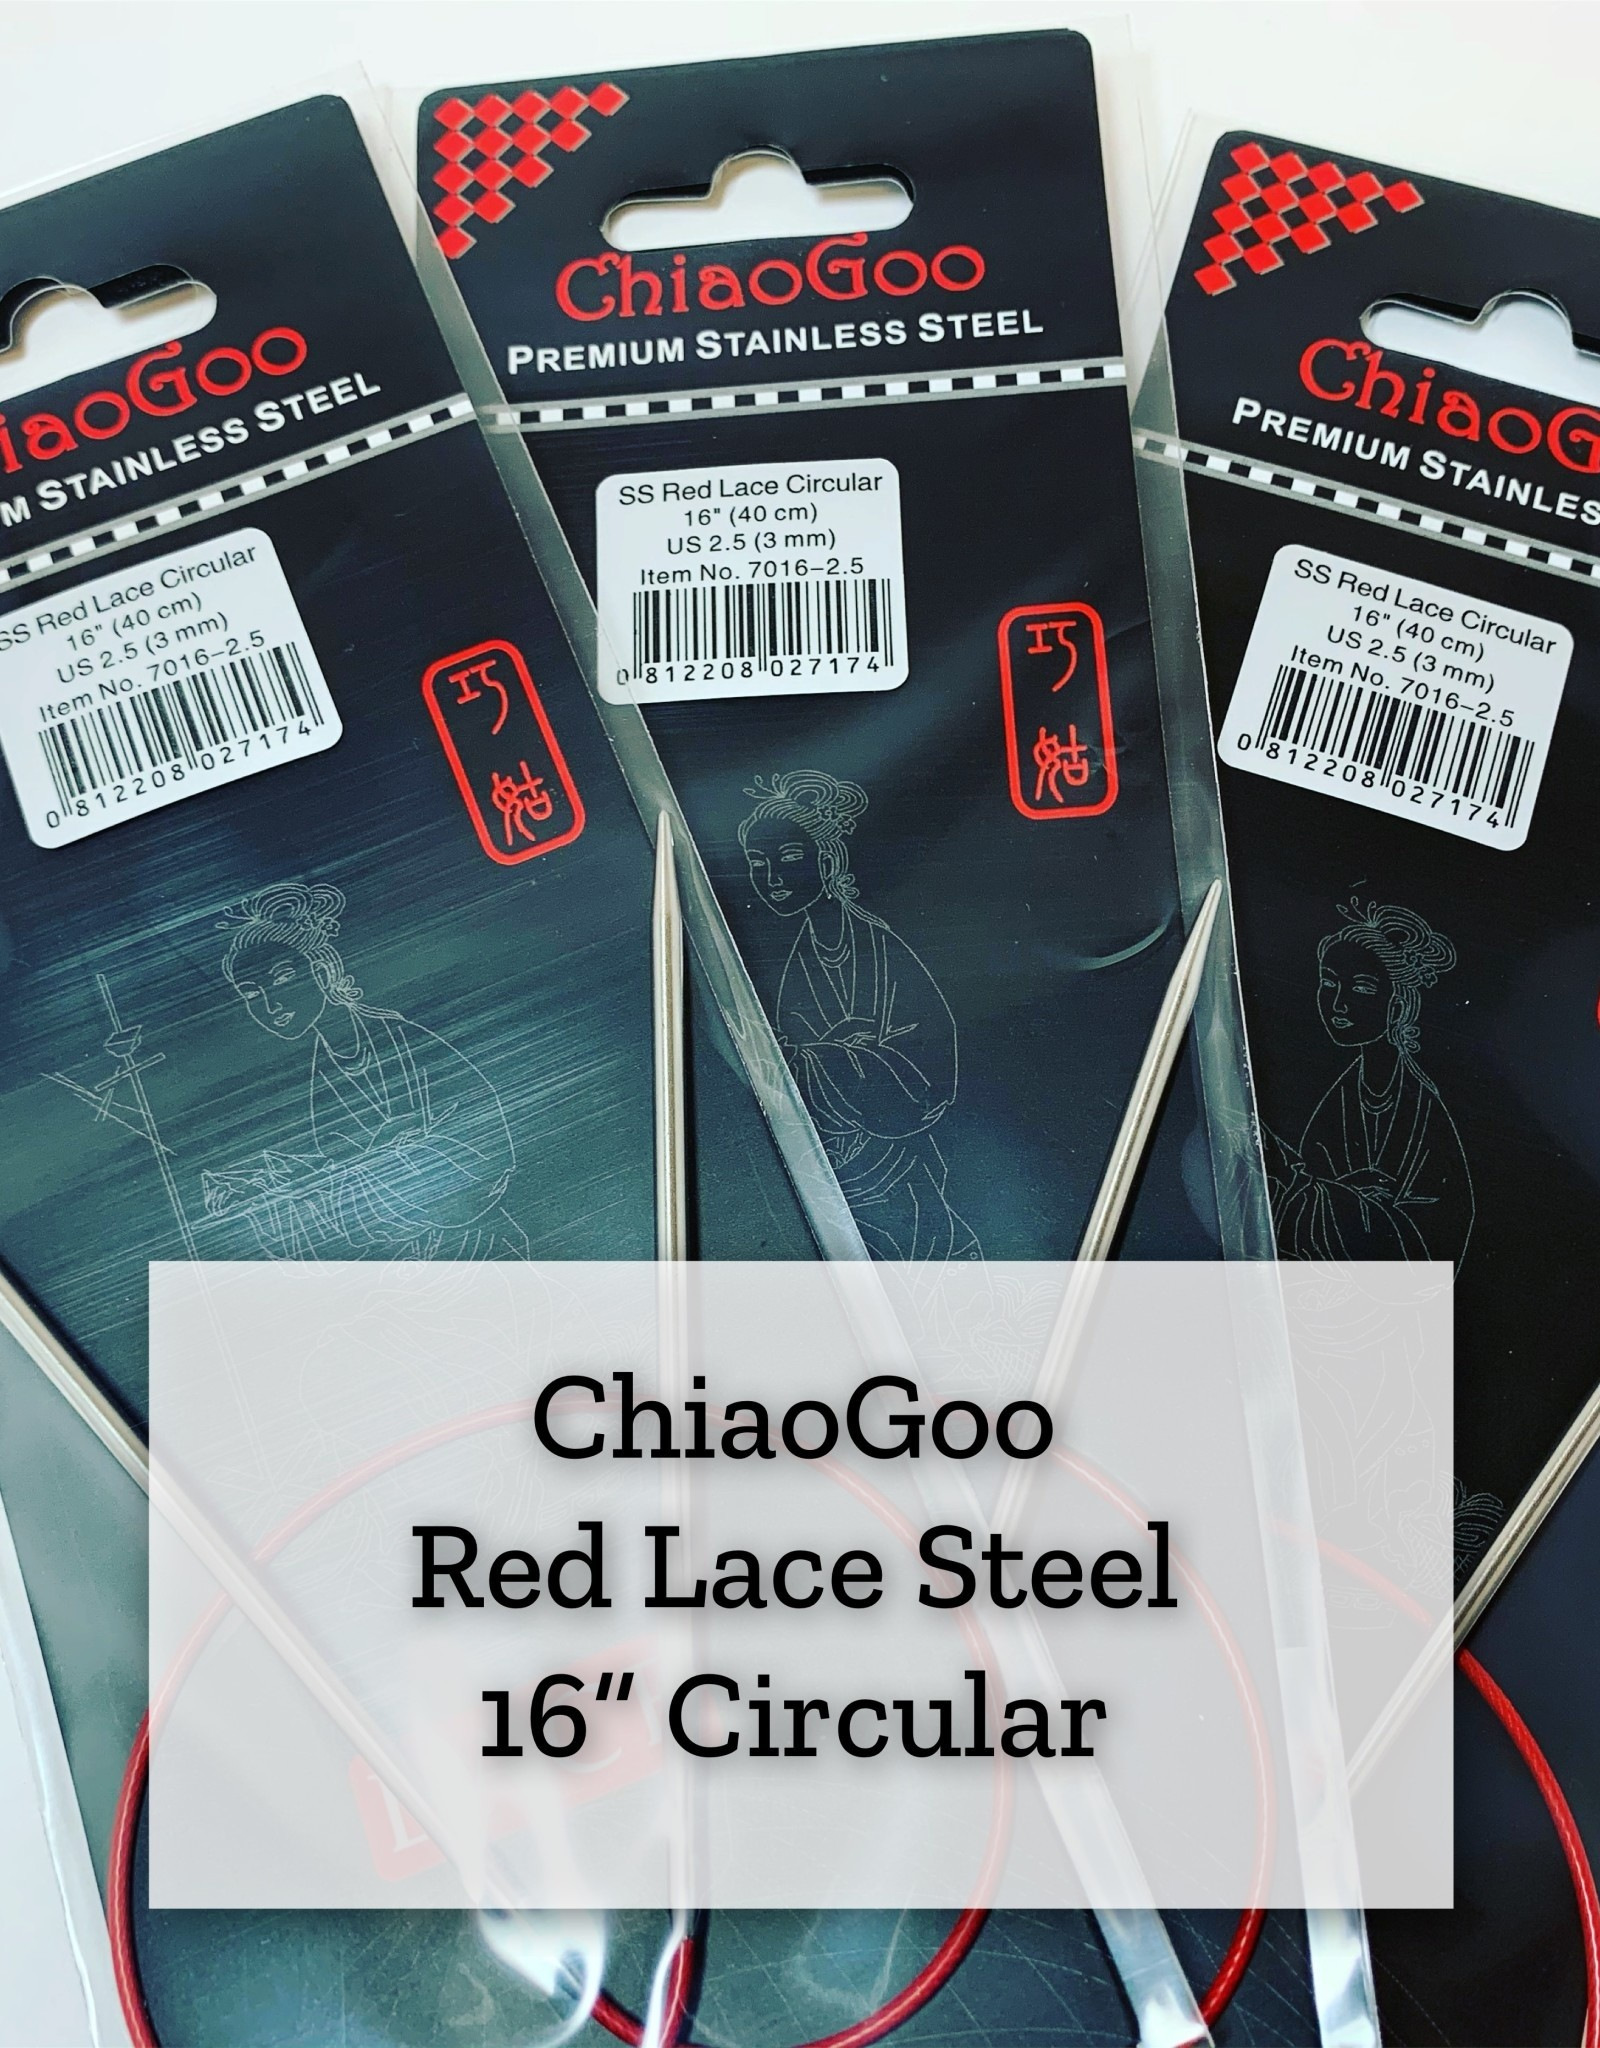 "ChiaoGoo Red Lace Steel - 16"" 8 mm"